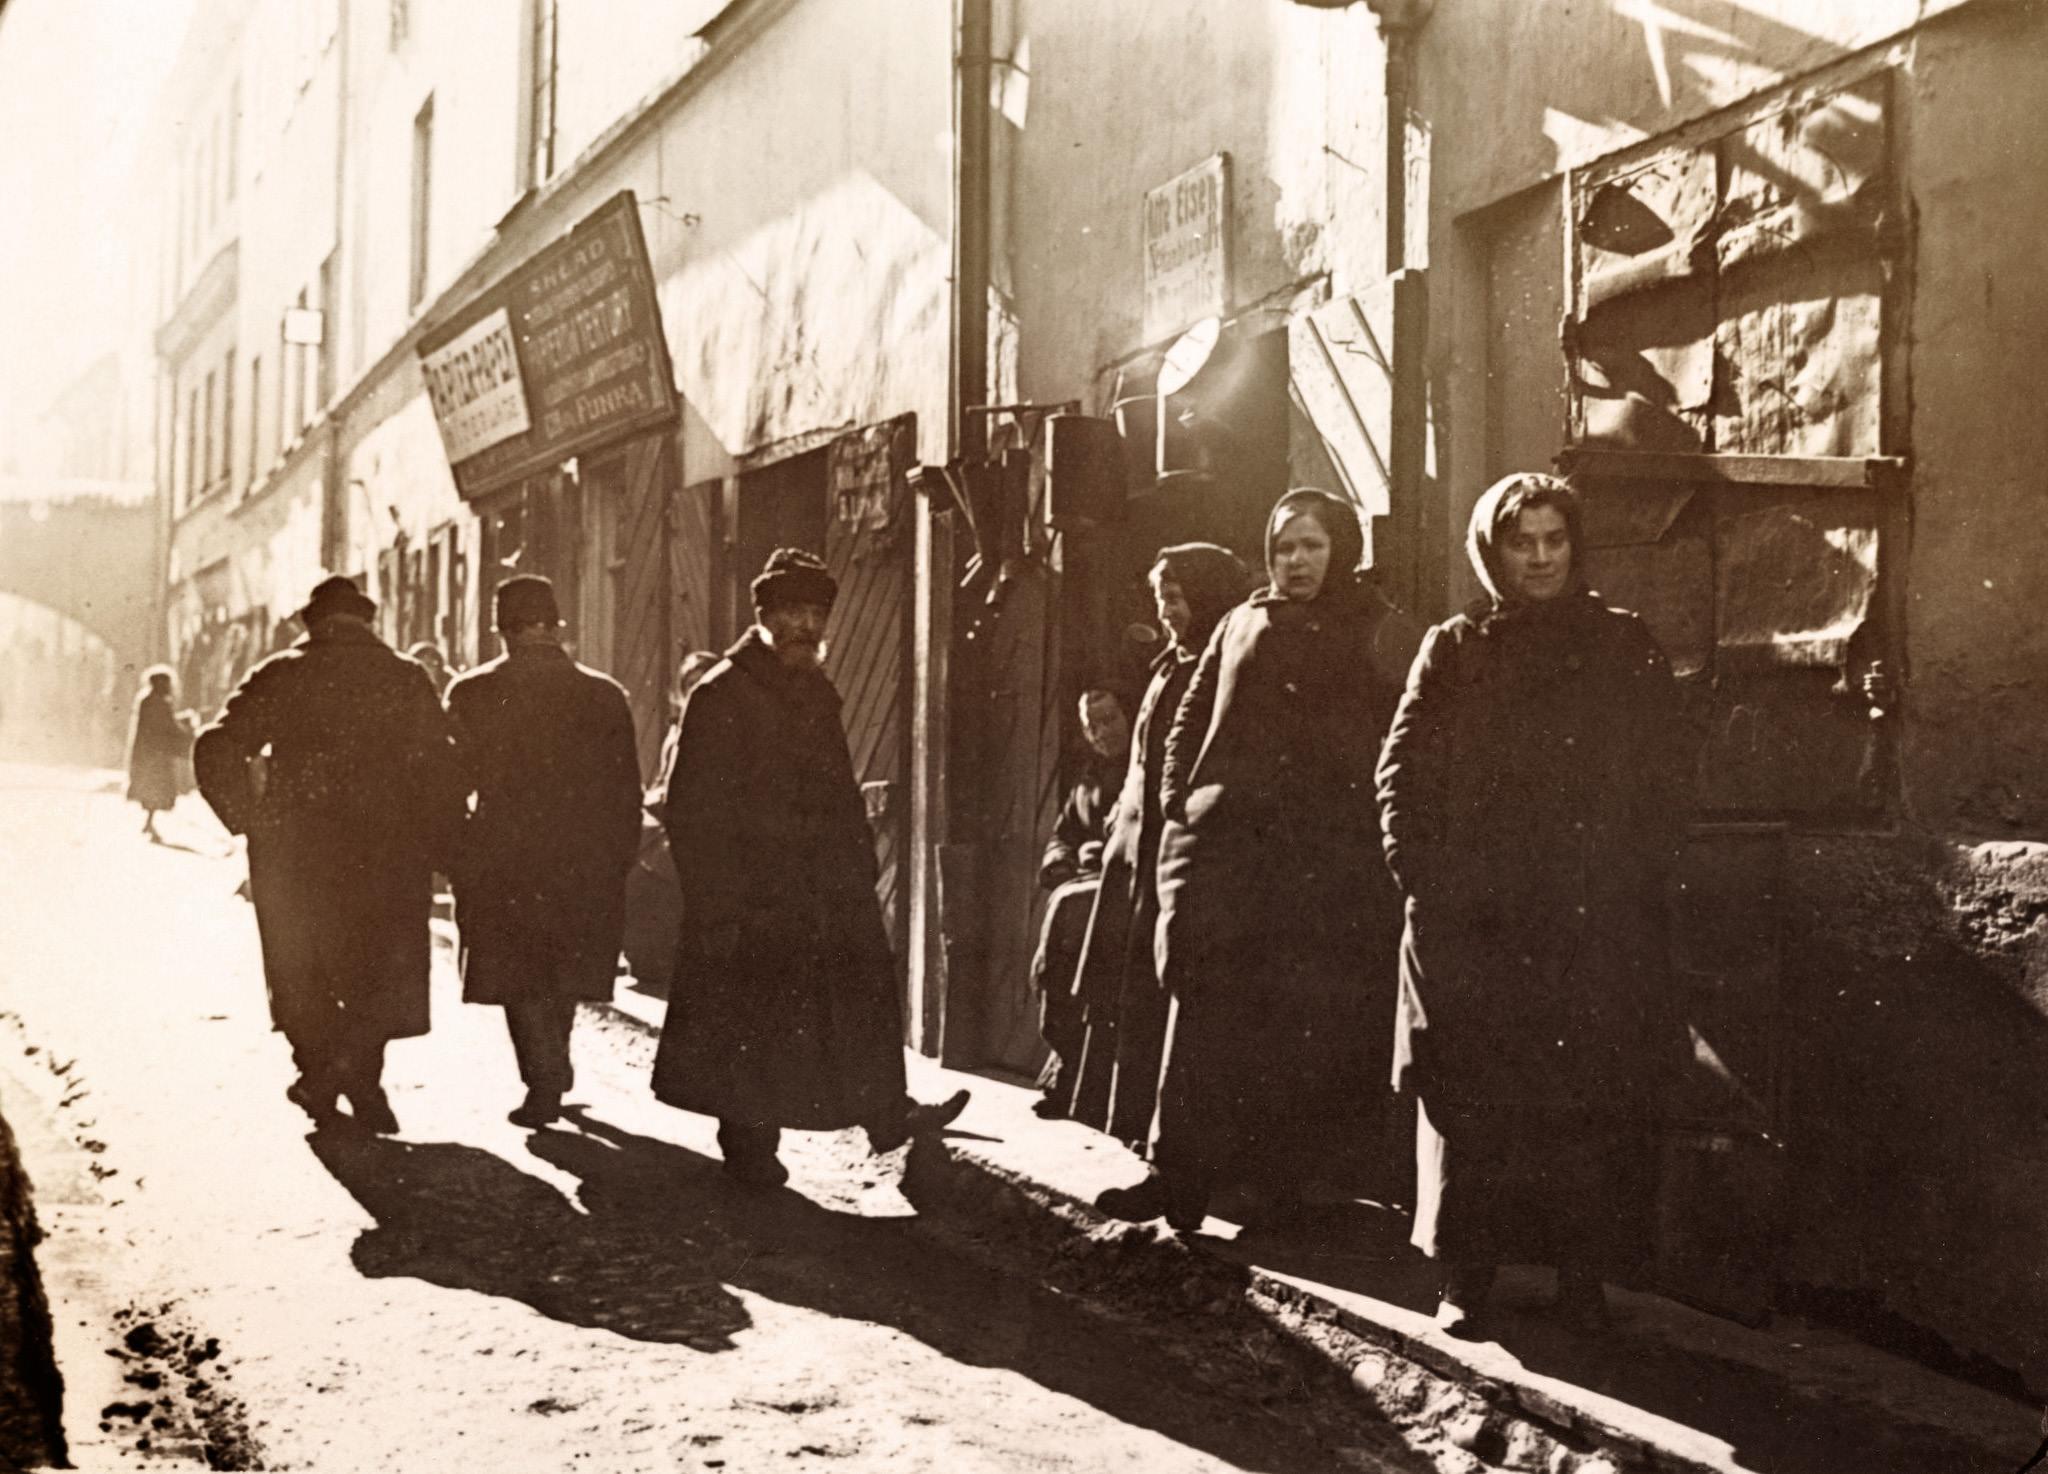 1916. Еврейский квартал